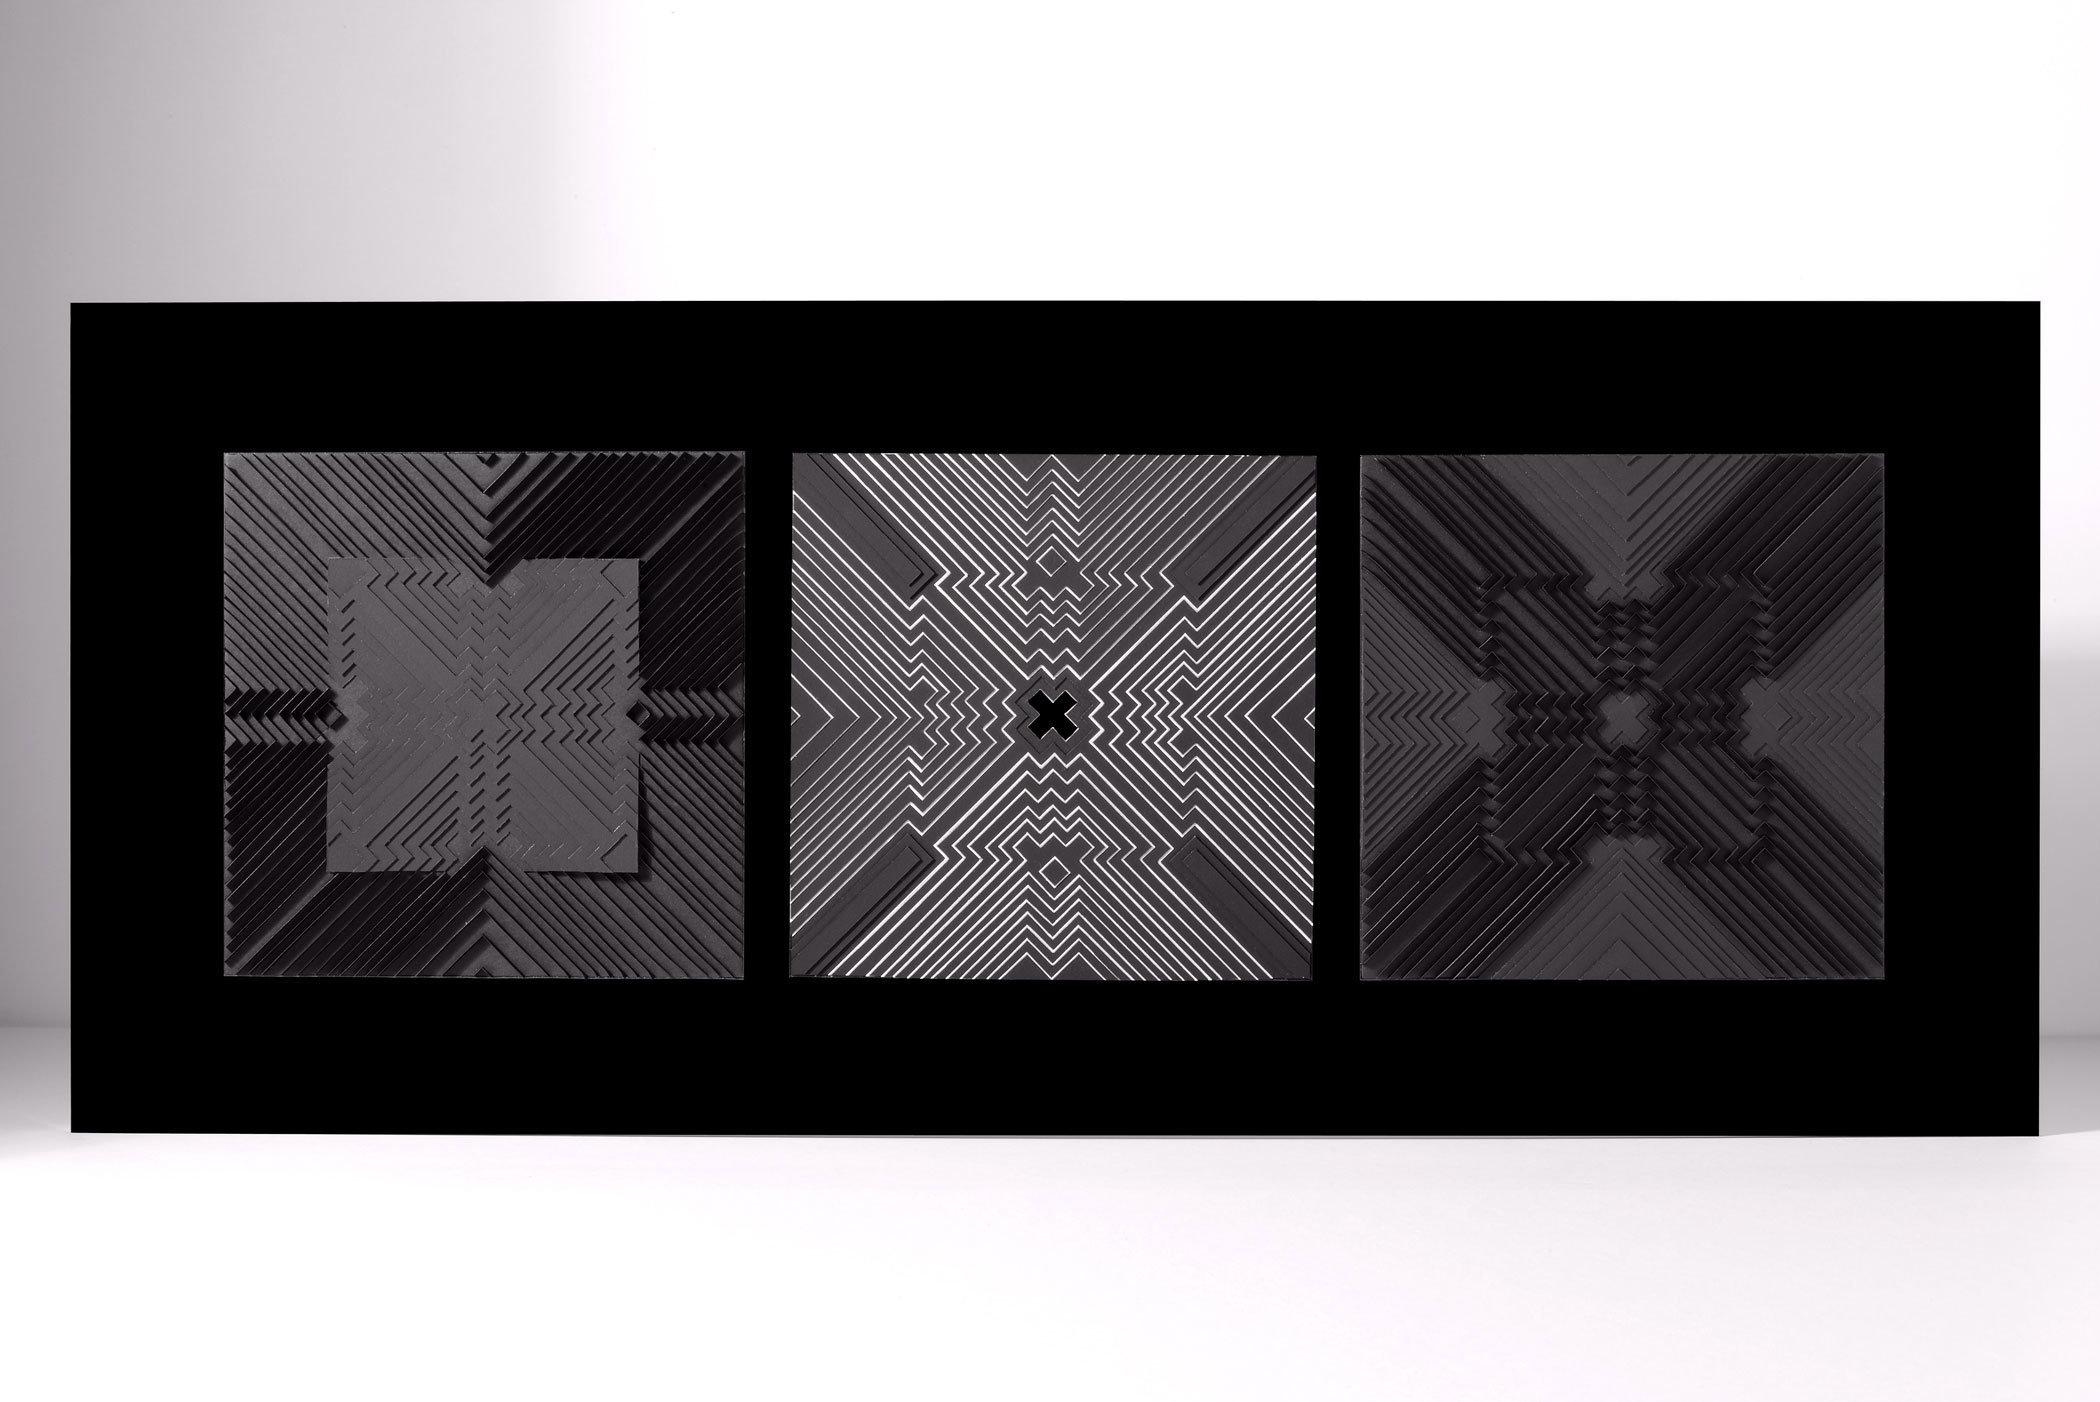 Farncoise-LUCIANI-NB-Horiz-face-76x32cm.jpg